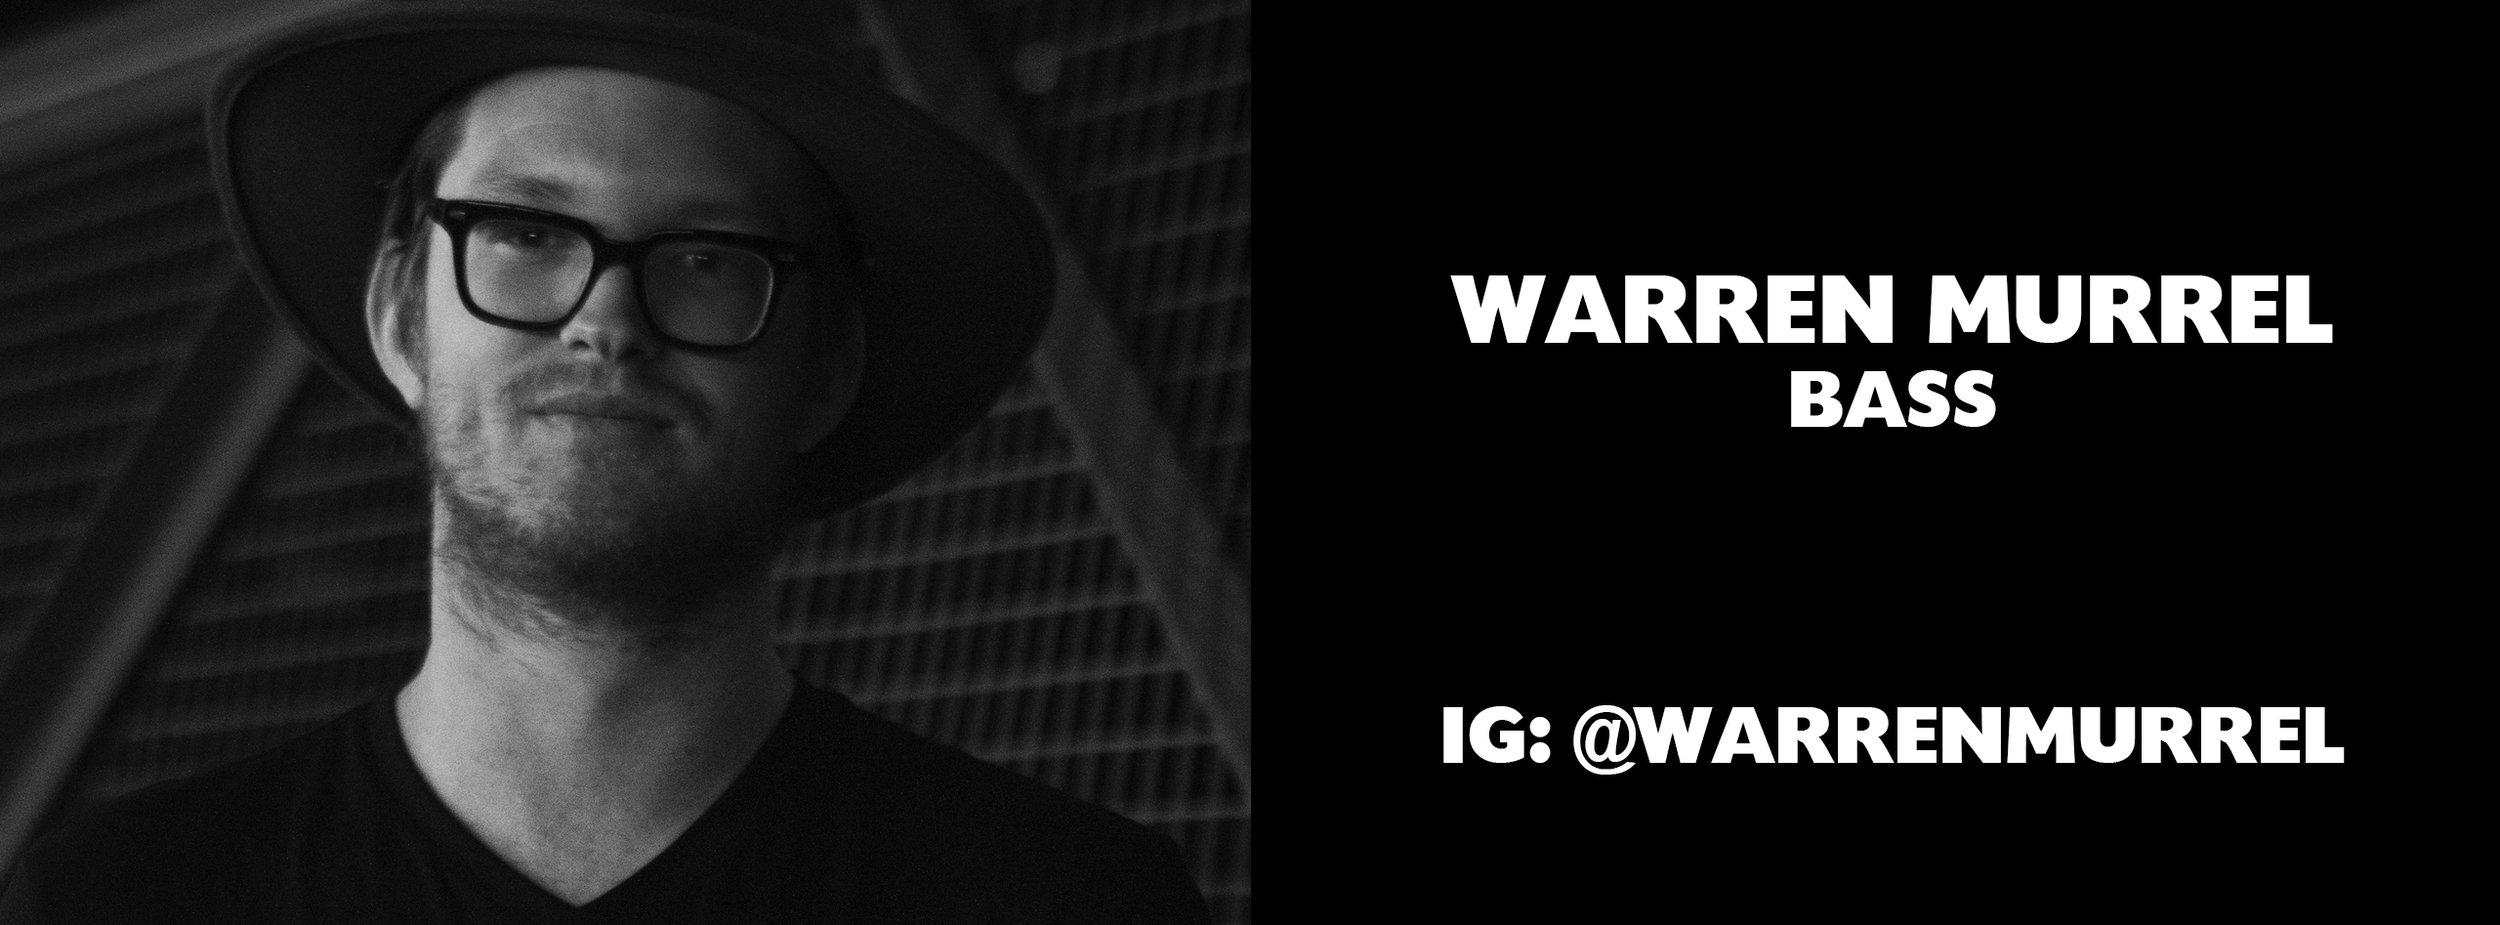 Warren_about.jpg